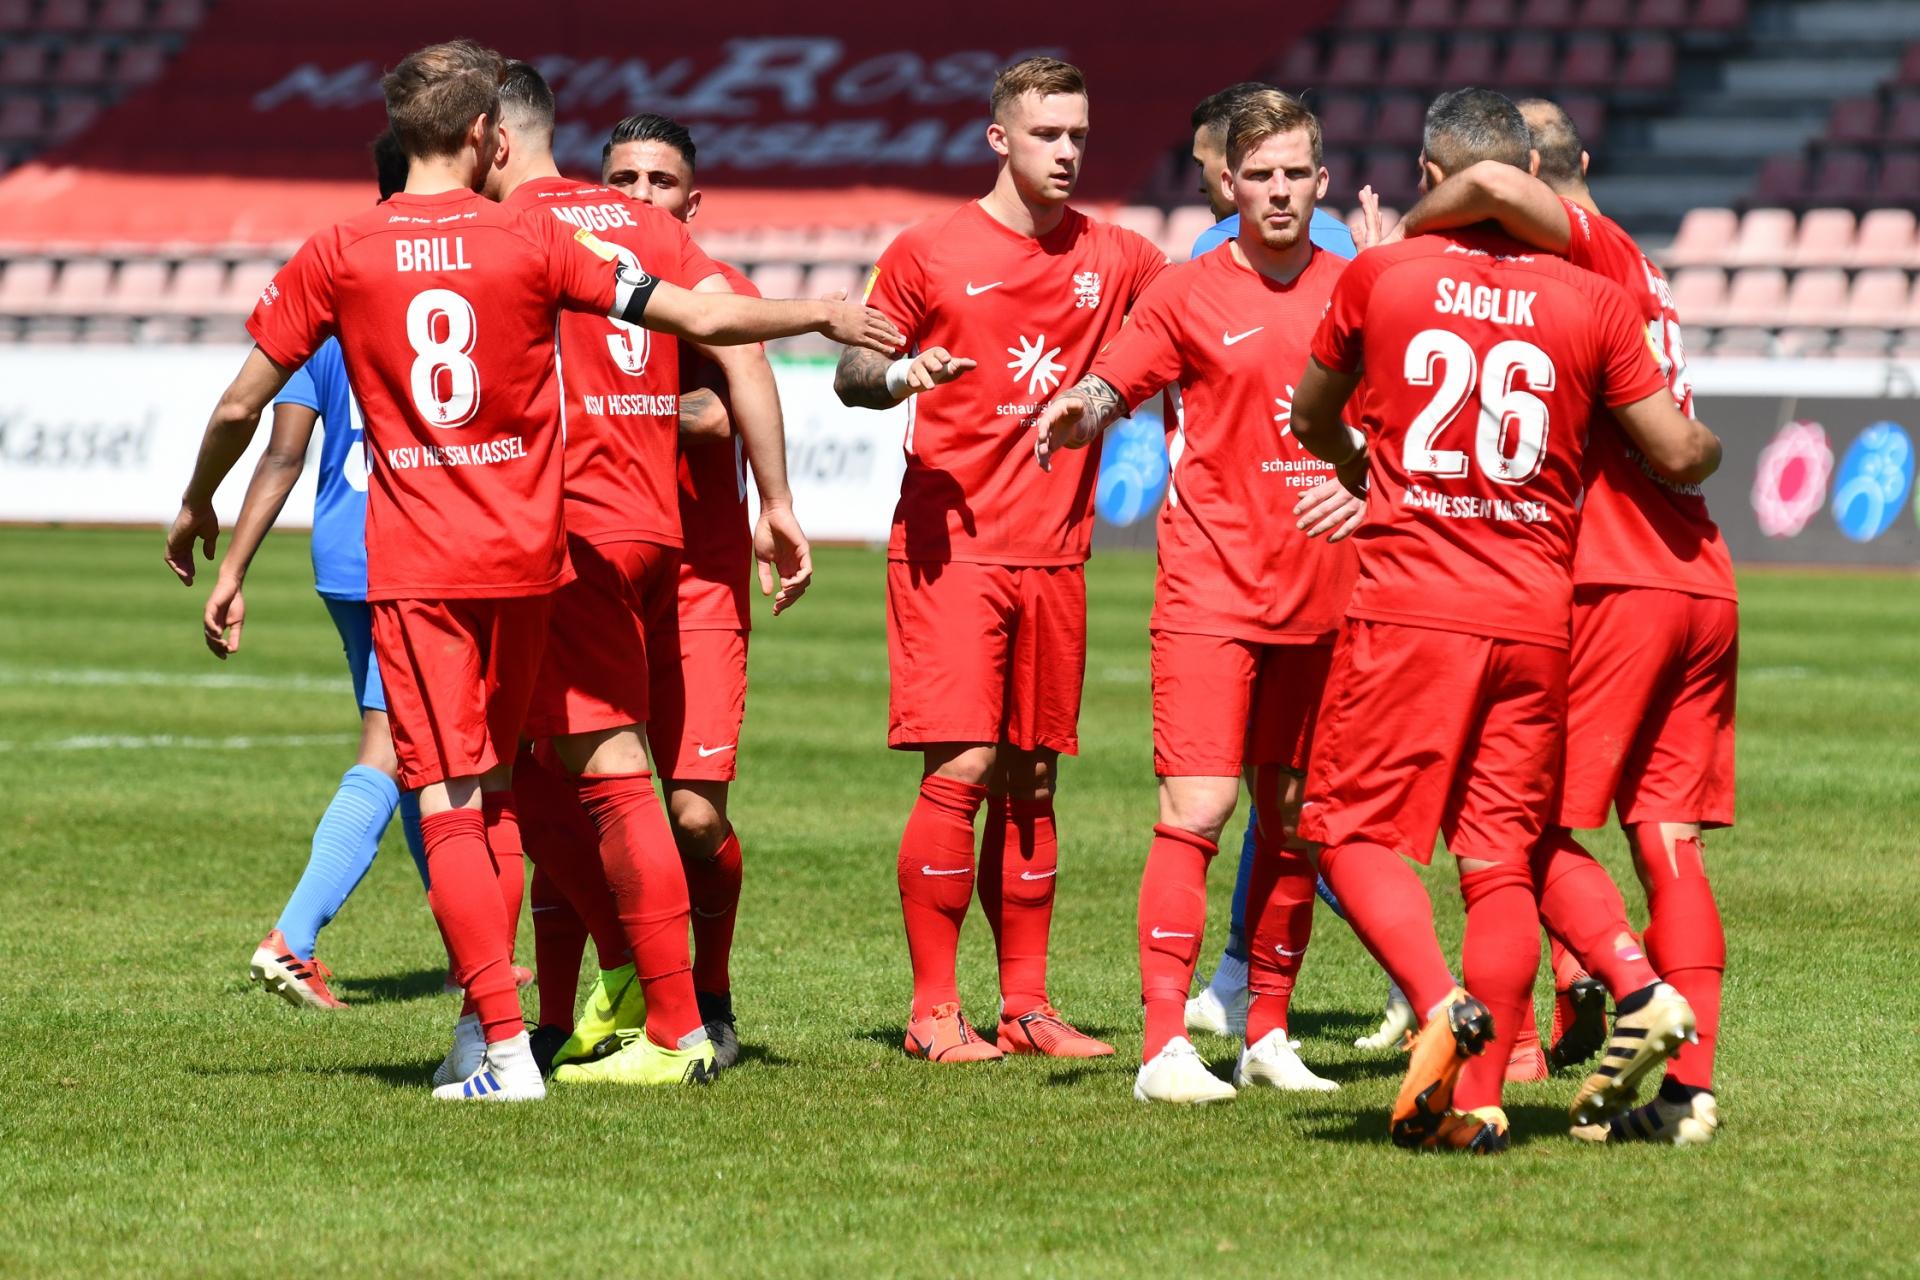 Lotto Hessenliga 2018/2019, KSV Hessen Kassel, T�rk G�c� Friedberg, Endstand 4:0, Jubel zum 4:0